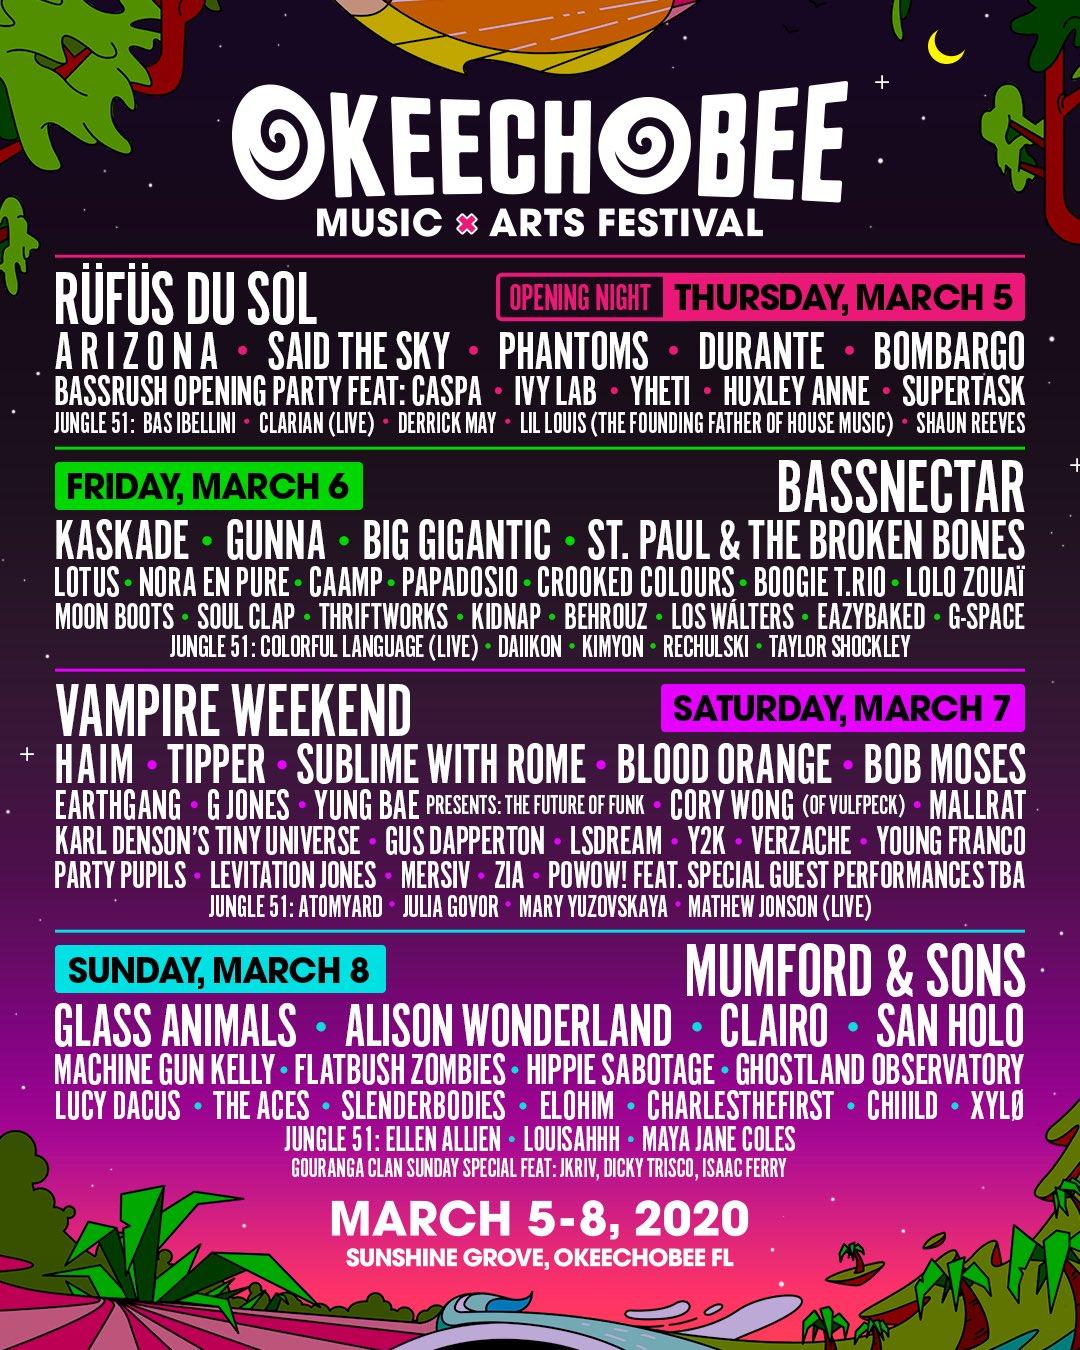 Okeechobee_Fest_2020